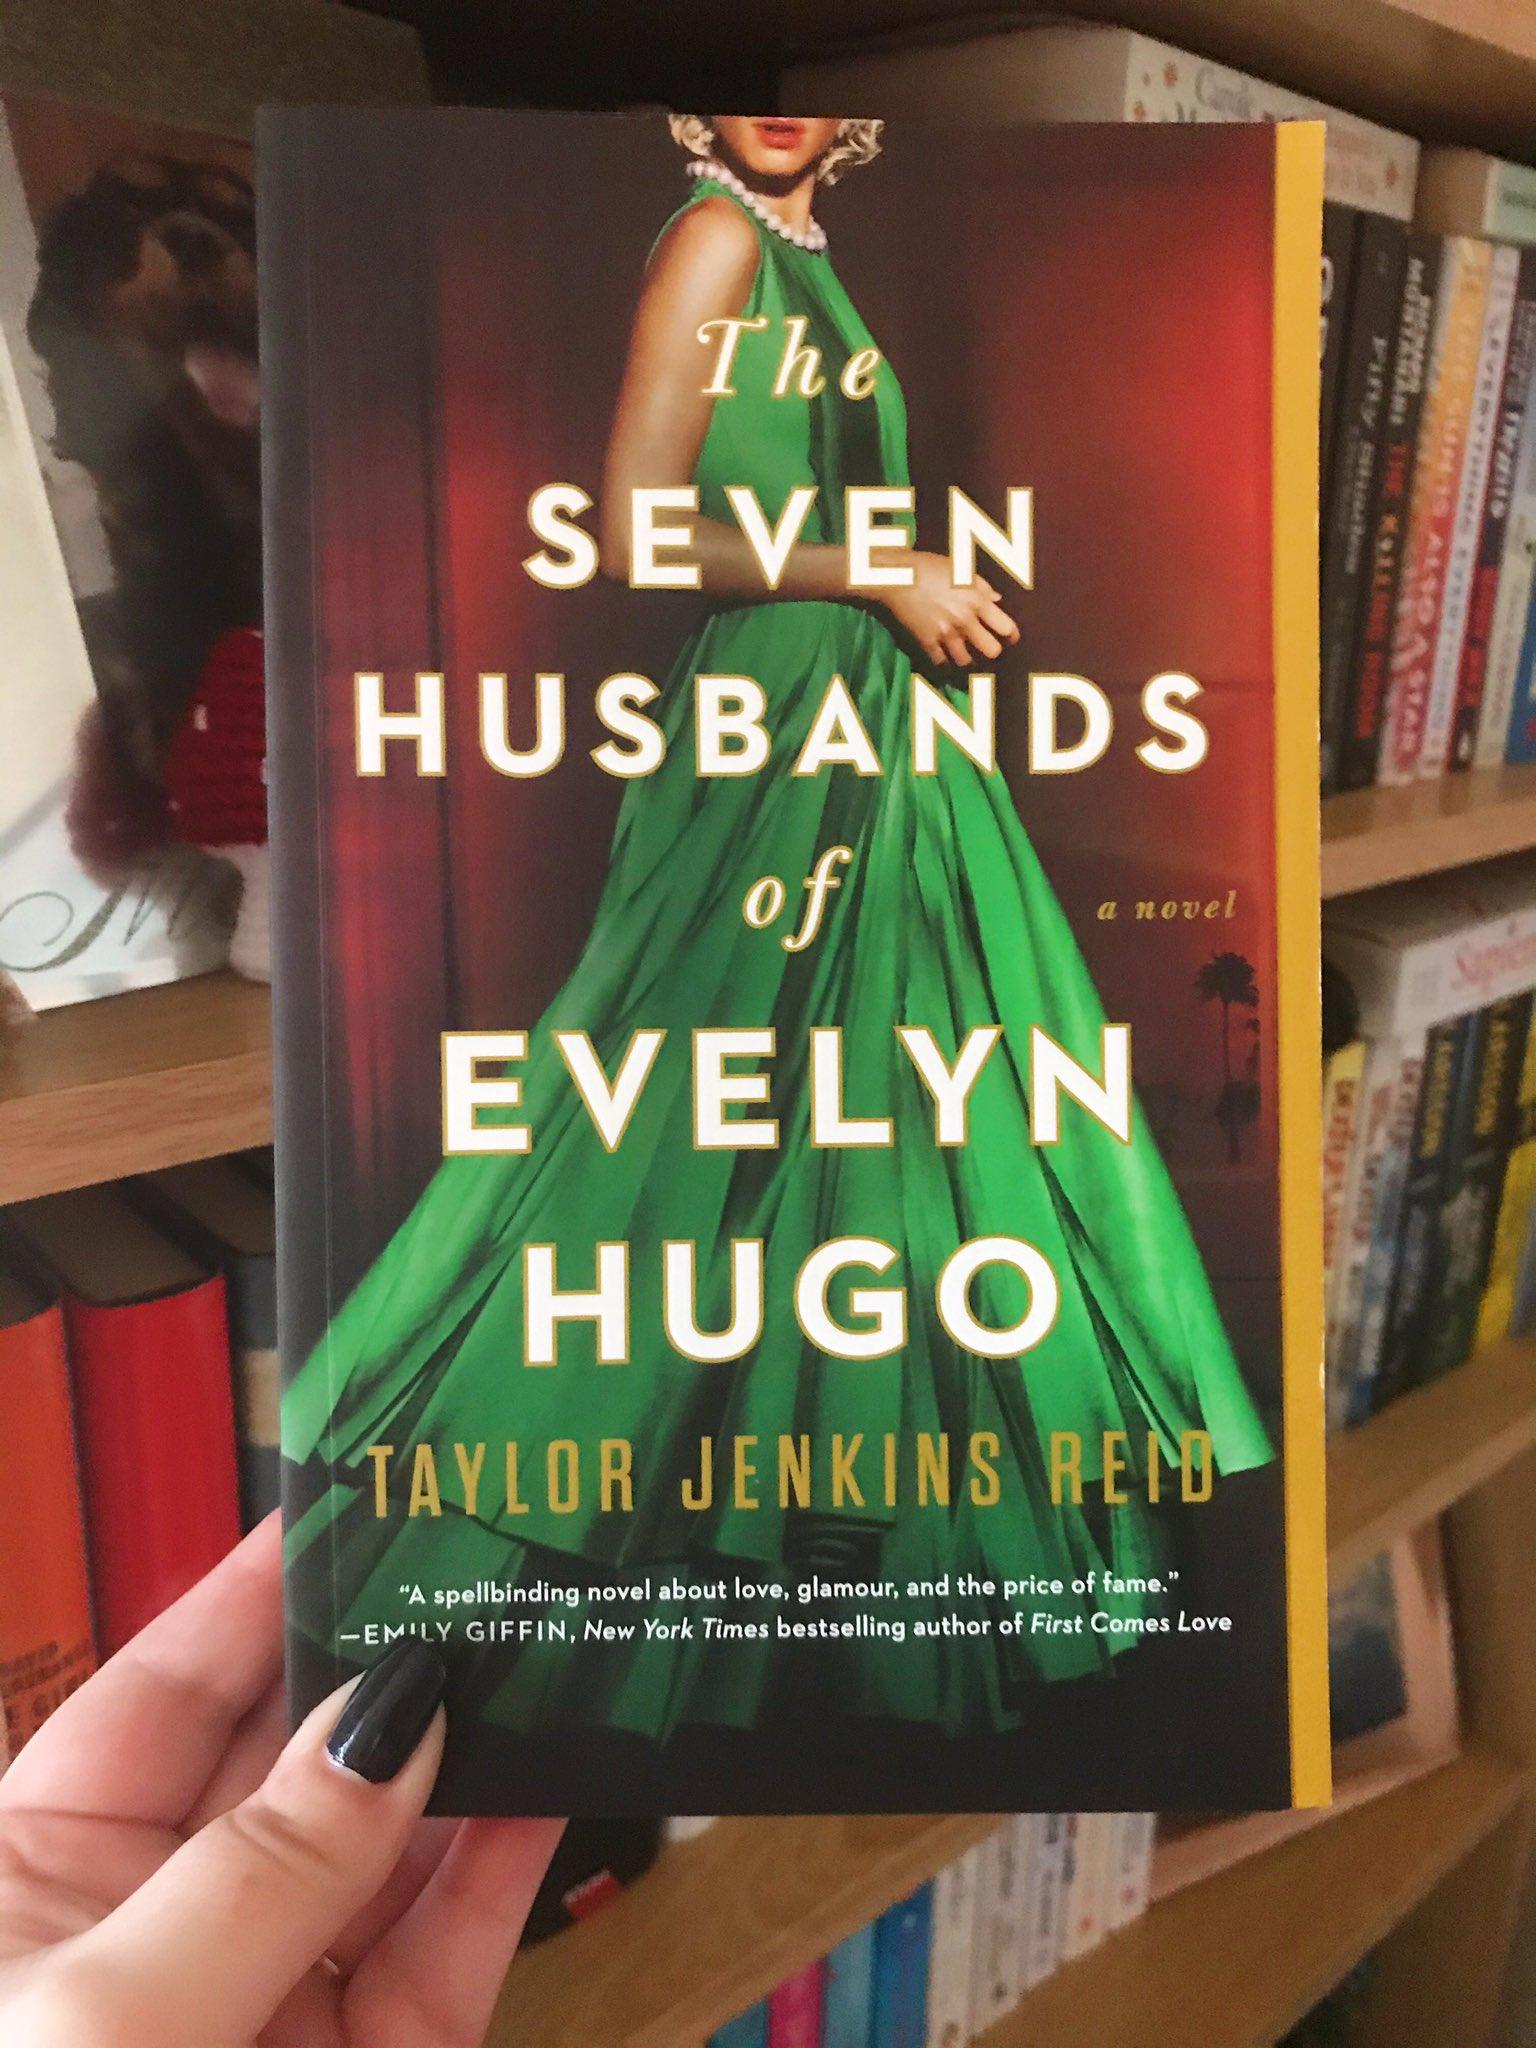 The Seven Husbands of Evelyn Hugo by Taylor Jenkins Reid held up in front of bookshelf